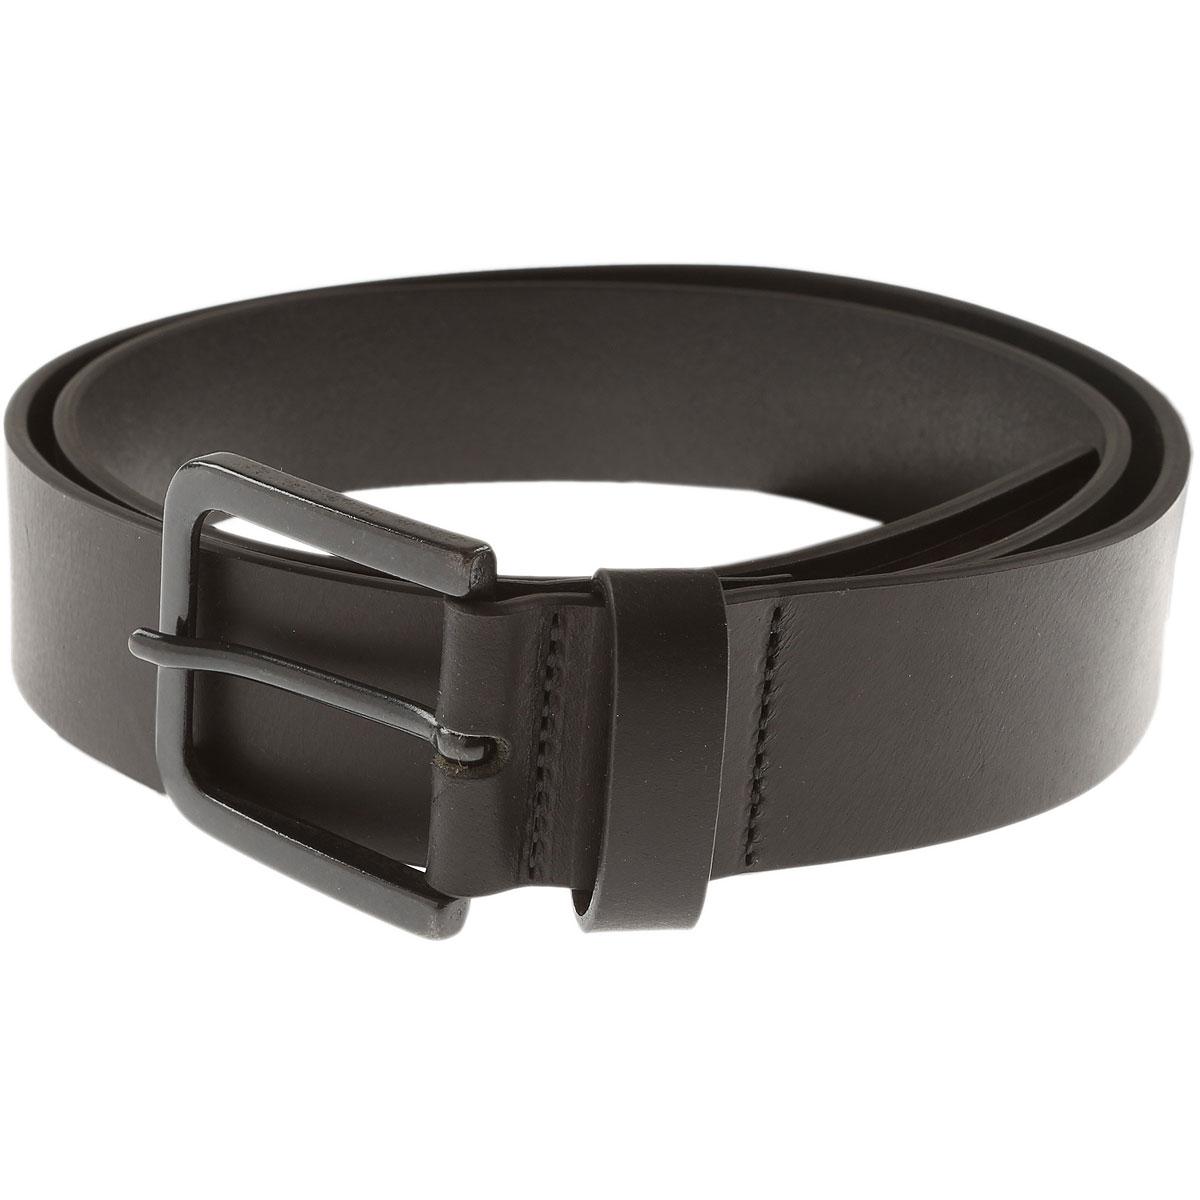 Image of Armani Jeans Belts, Black, Leather, 2017, 36 38 40 42 44